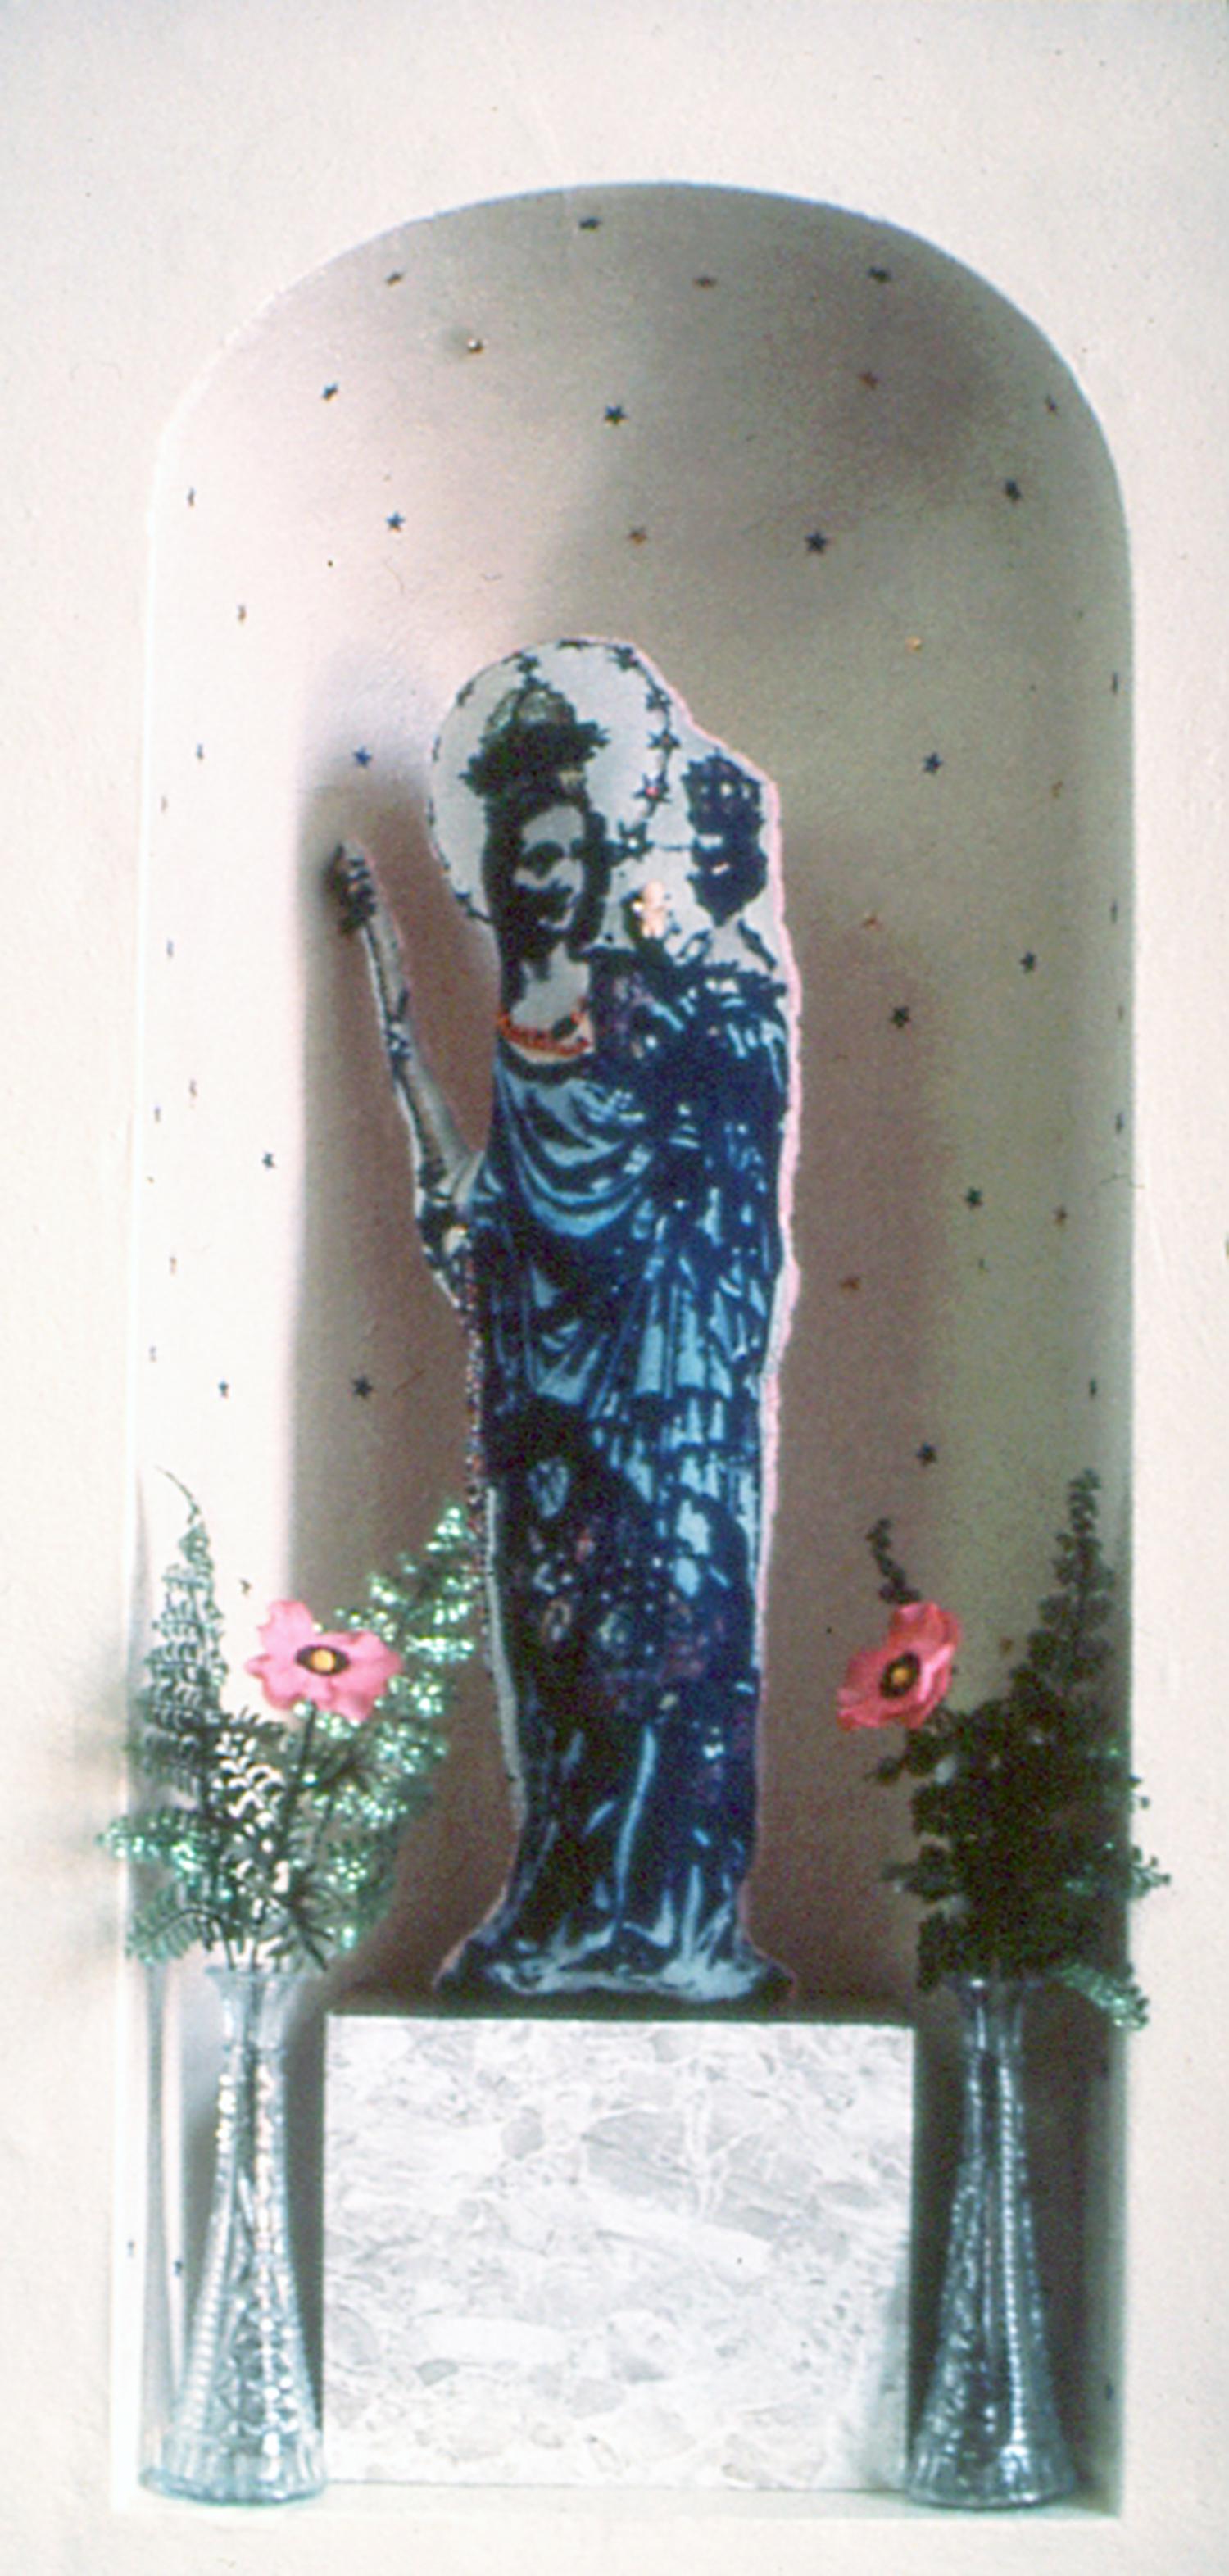 1975  Autel   cyanotype and mixed media